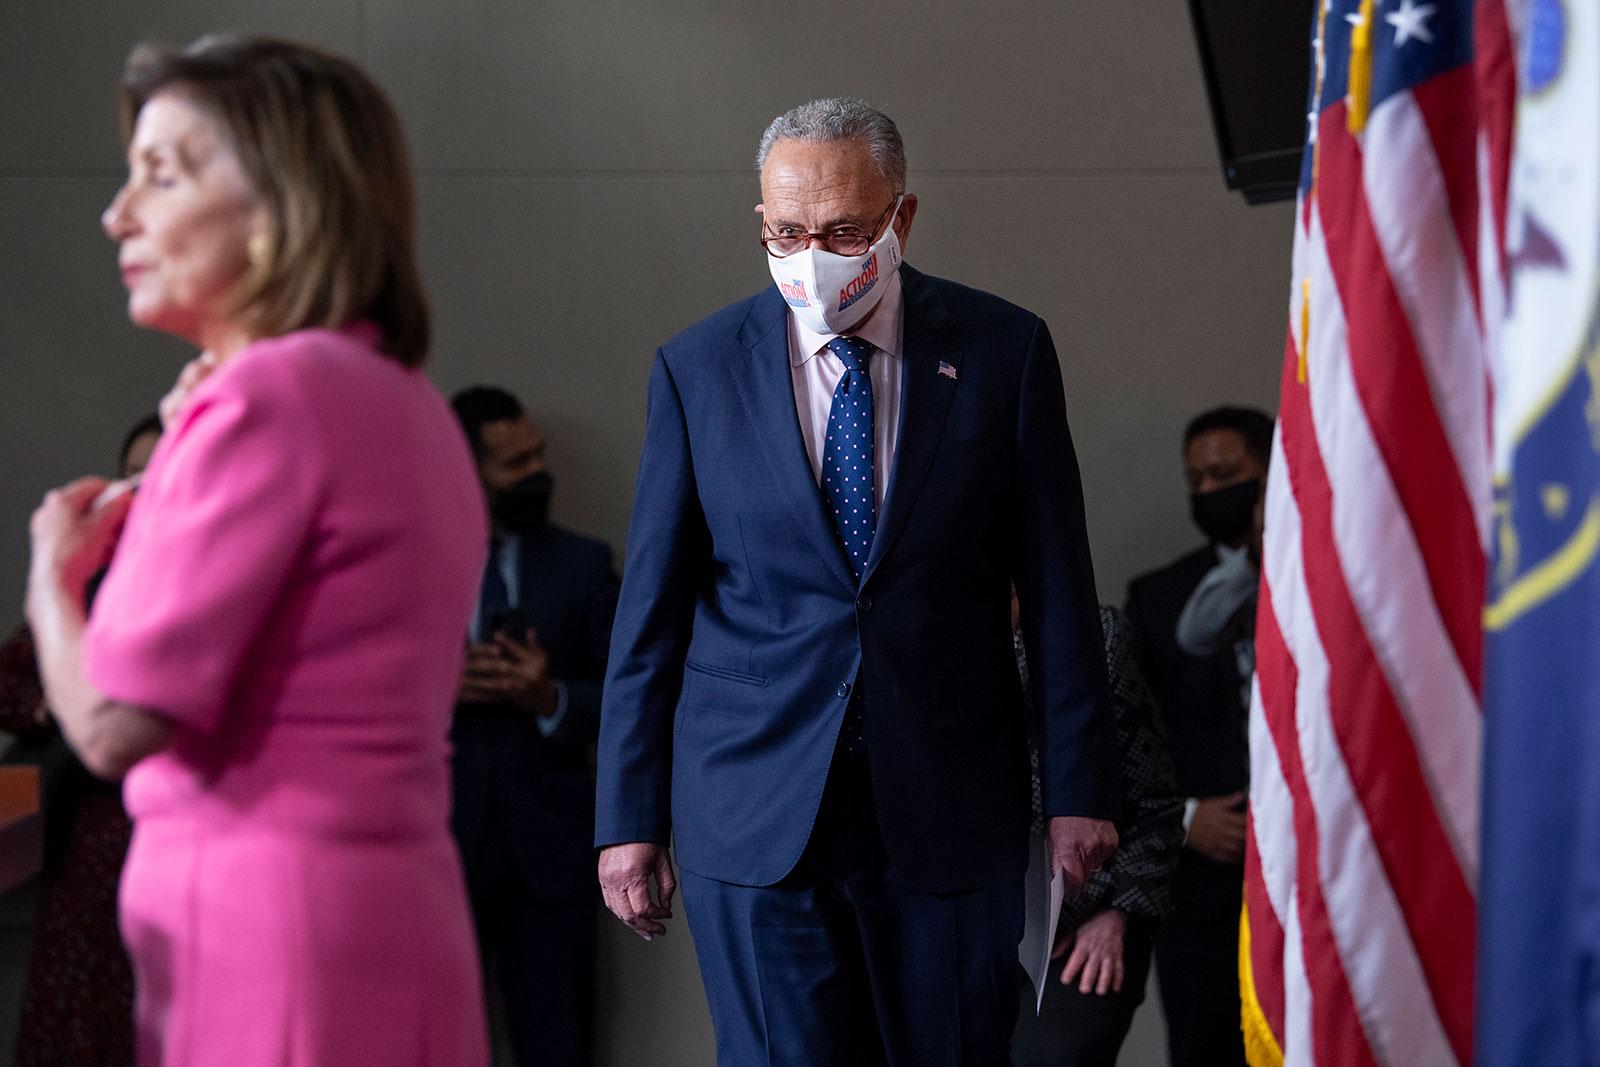 House Speaker Nancy Pelosi, left, and Senate Majority Leader Chuck Schumer arrive for a press conference on September 23.